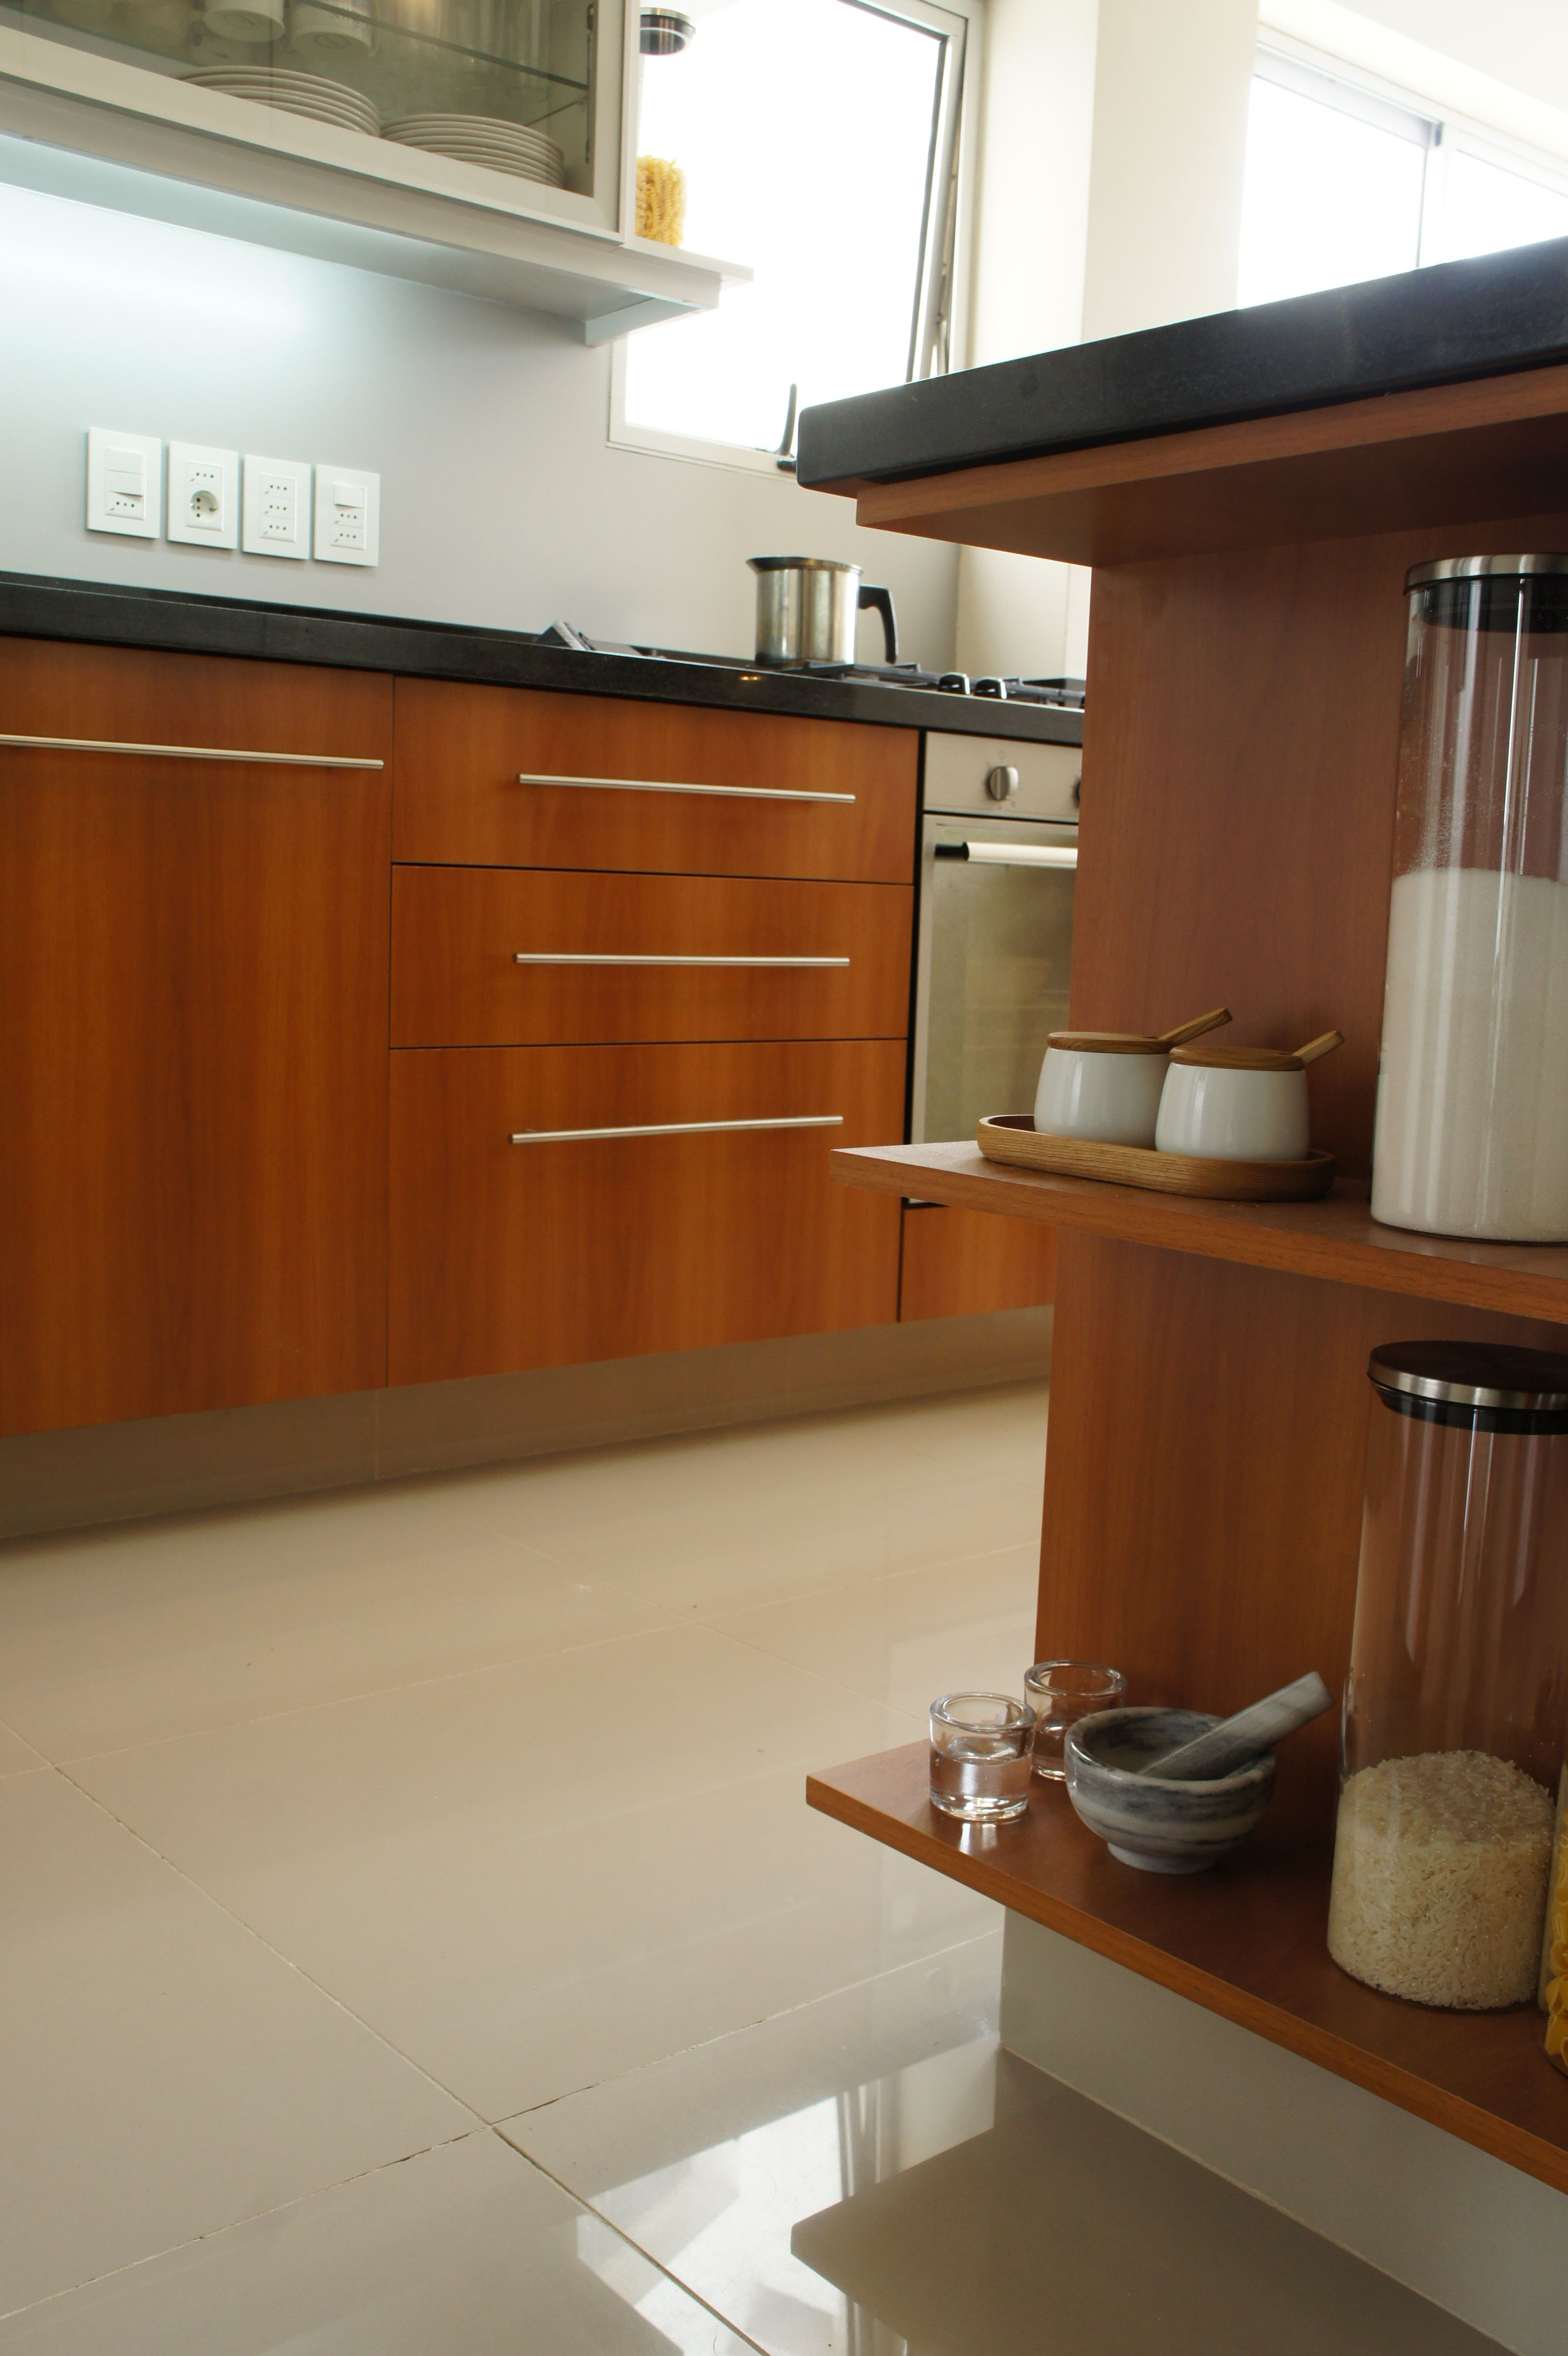 Grupo3 Cocina Nogal Brianza Detalle De Modulo Abierto Kitchen Cabinets Kitchen Home Decor